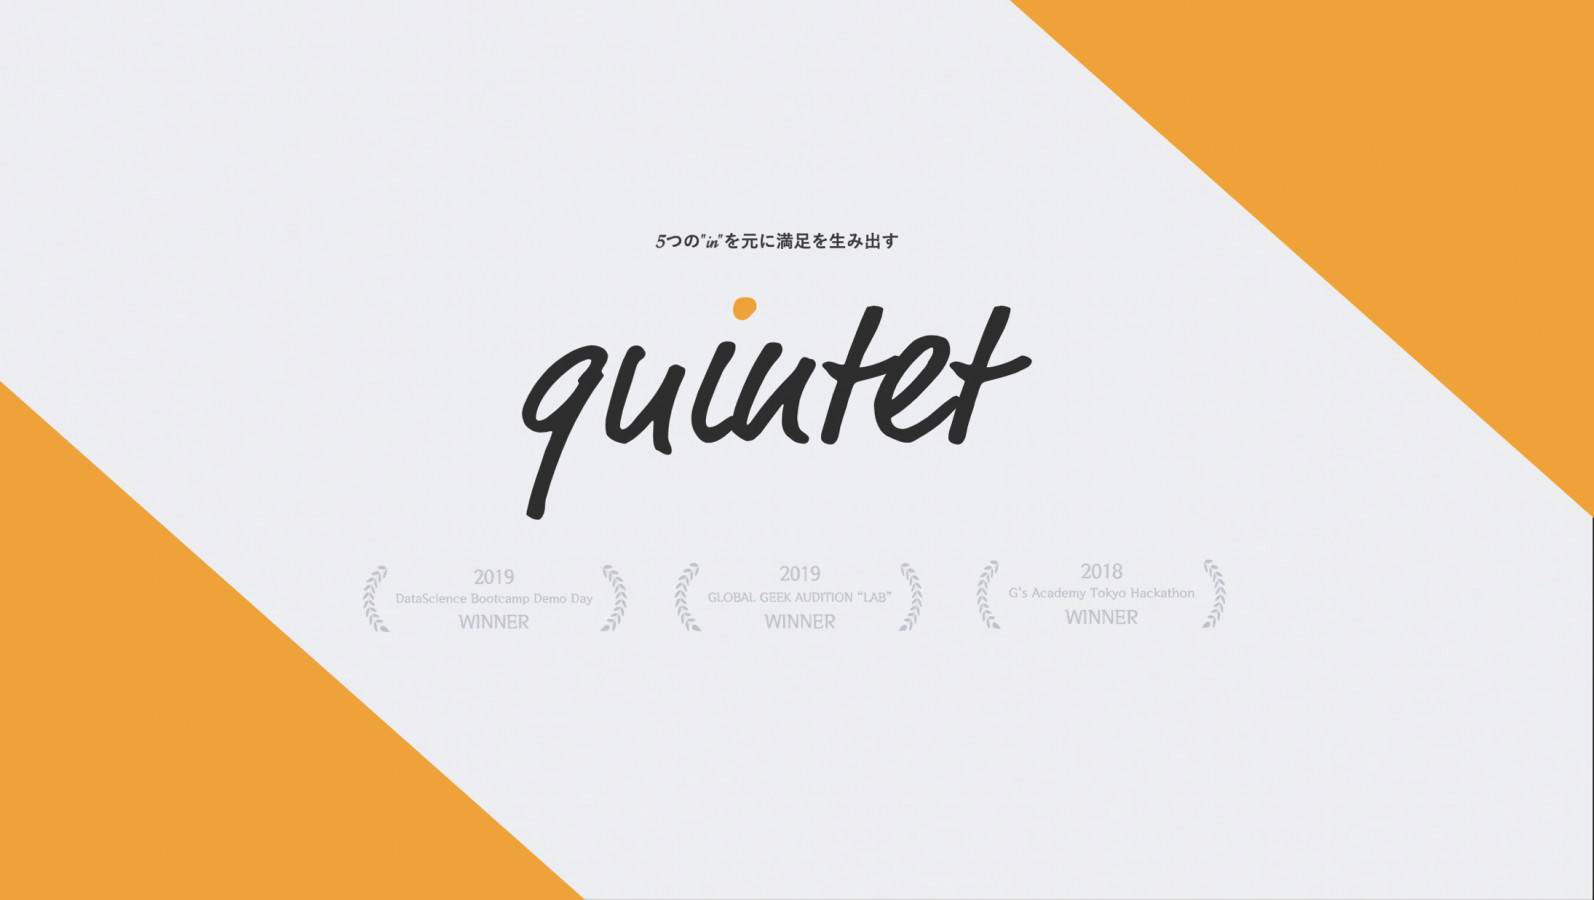 quintet株式会社サムネイル画像